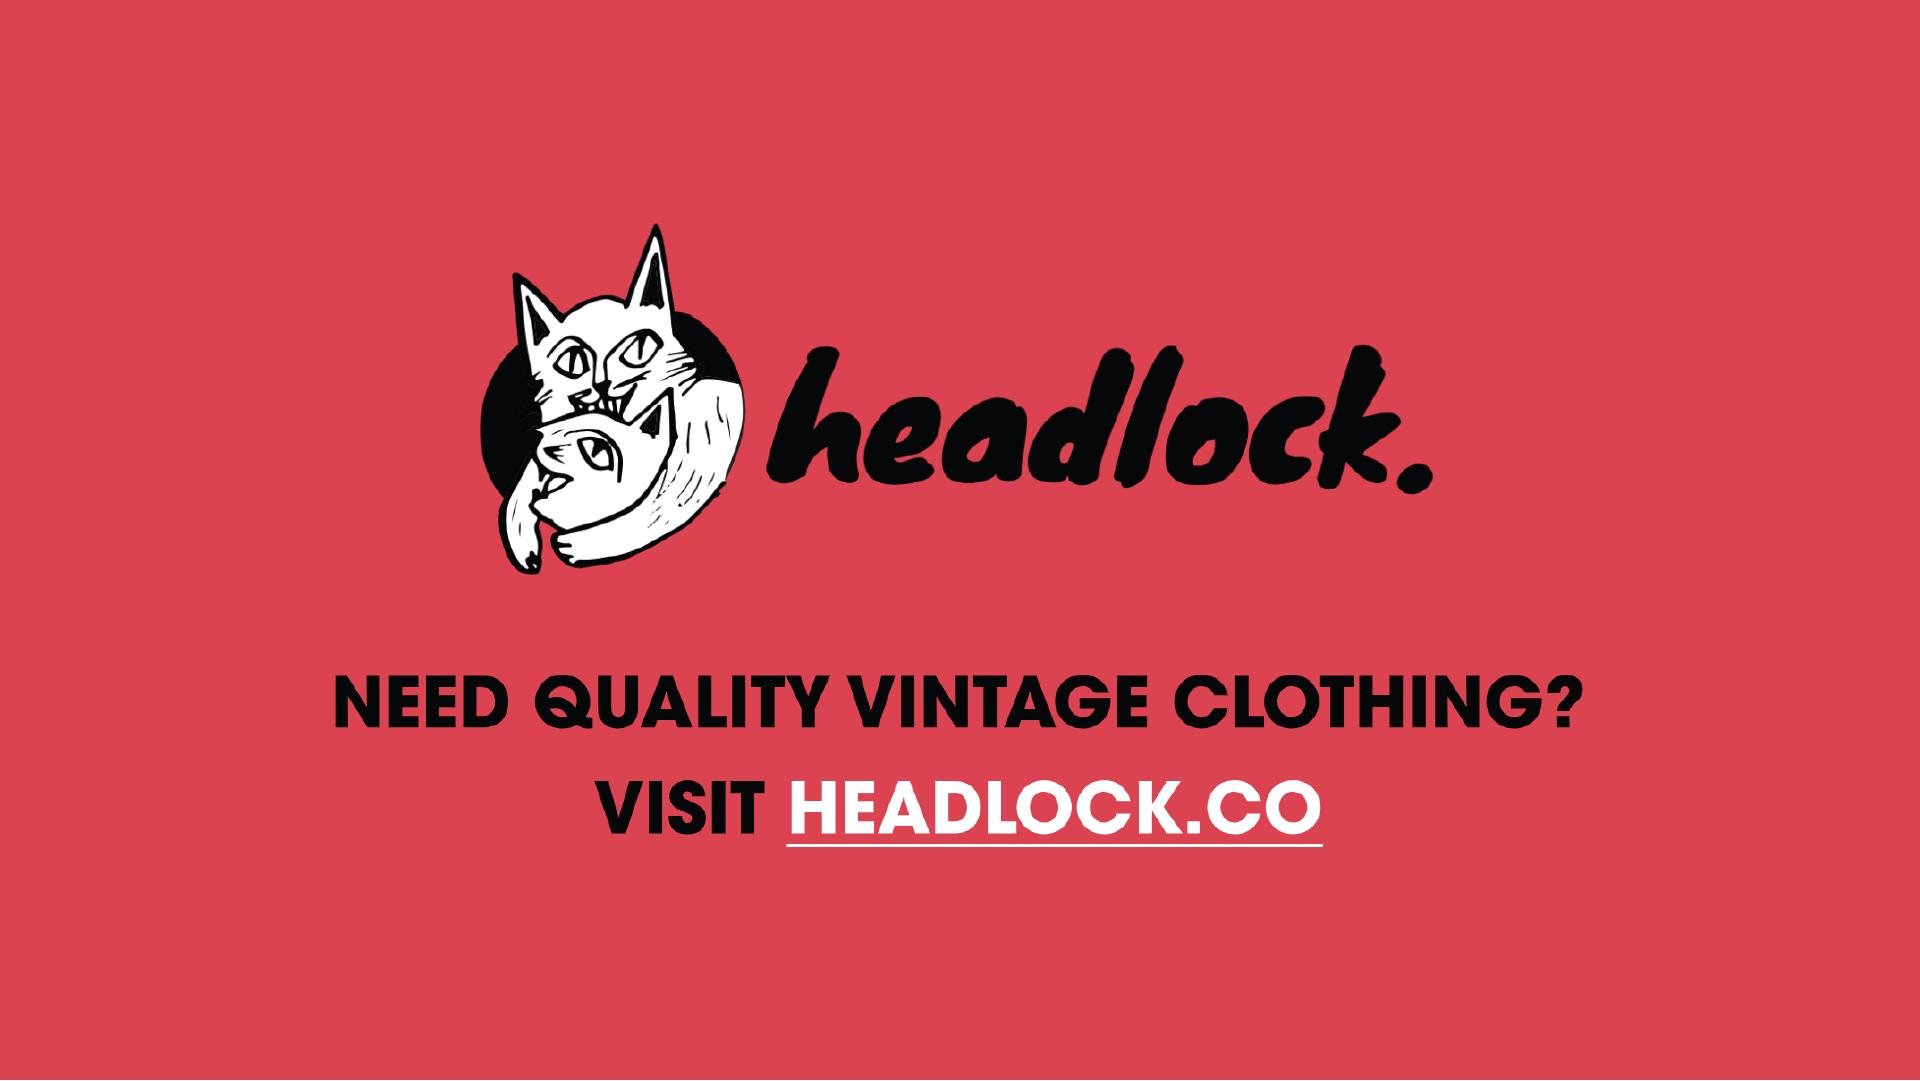 headlock vintage clothing